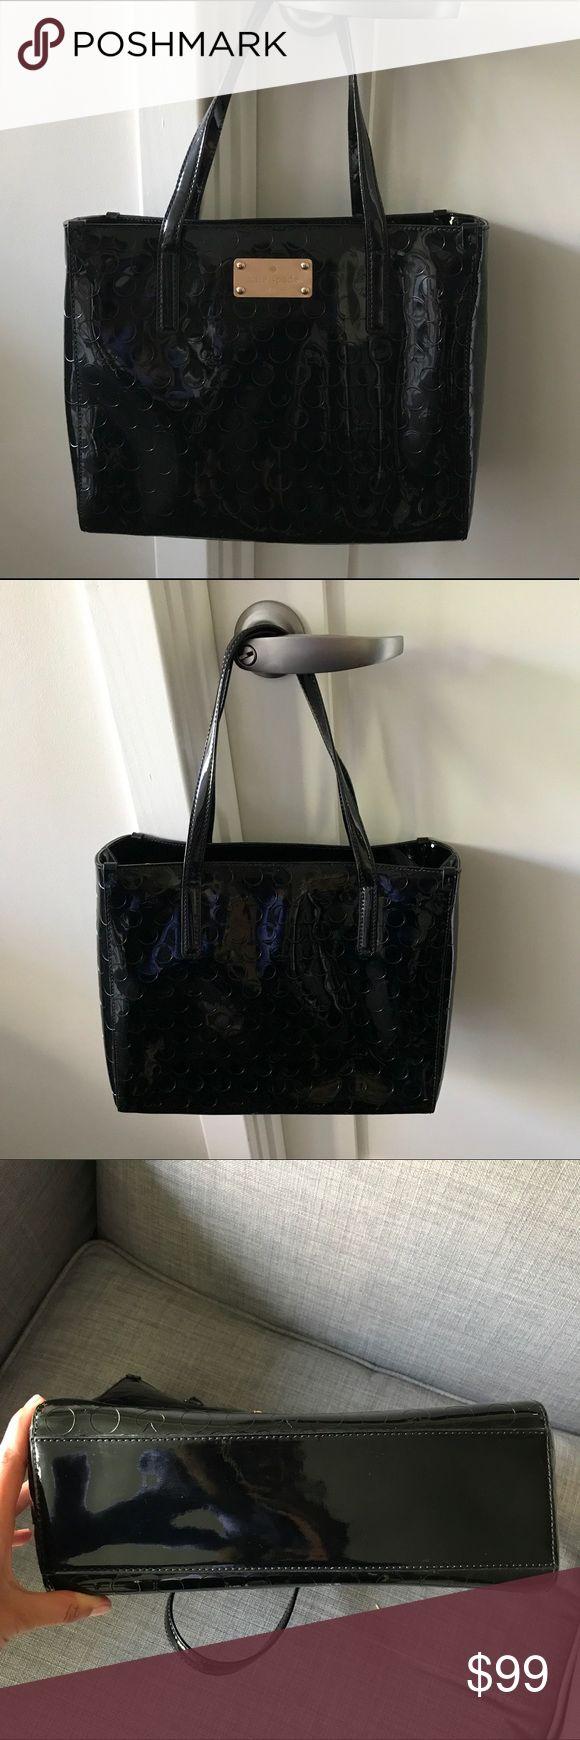 Kate Spade Patent Leather Polka Dot Handbag Never been used Kate Spade patent leather polka dot handbag. Inside zipped pocket. Dimensions: 11 1/2 x 9 1/2 x 4 1/2 inches. kate spade Bags Shoulder Bags